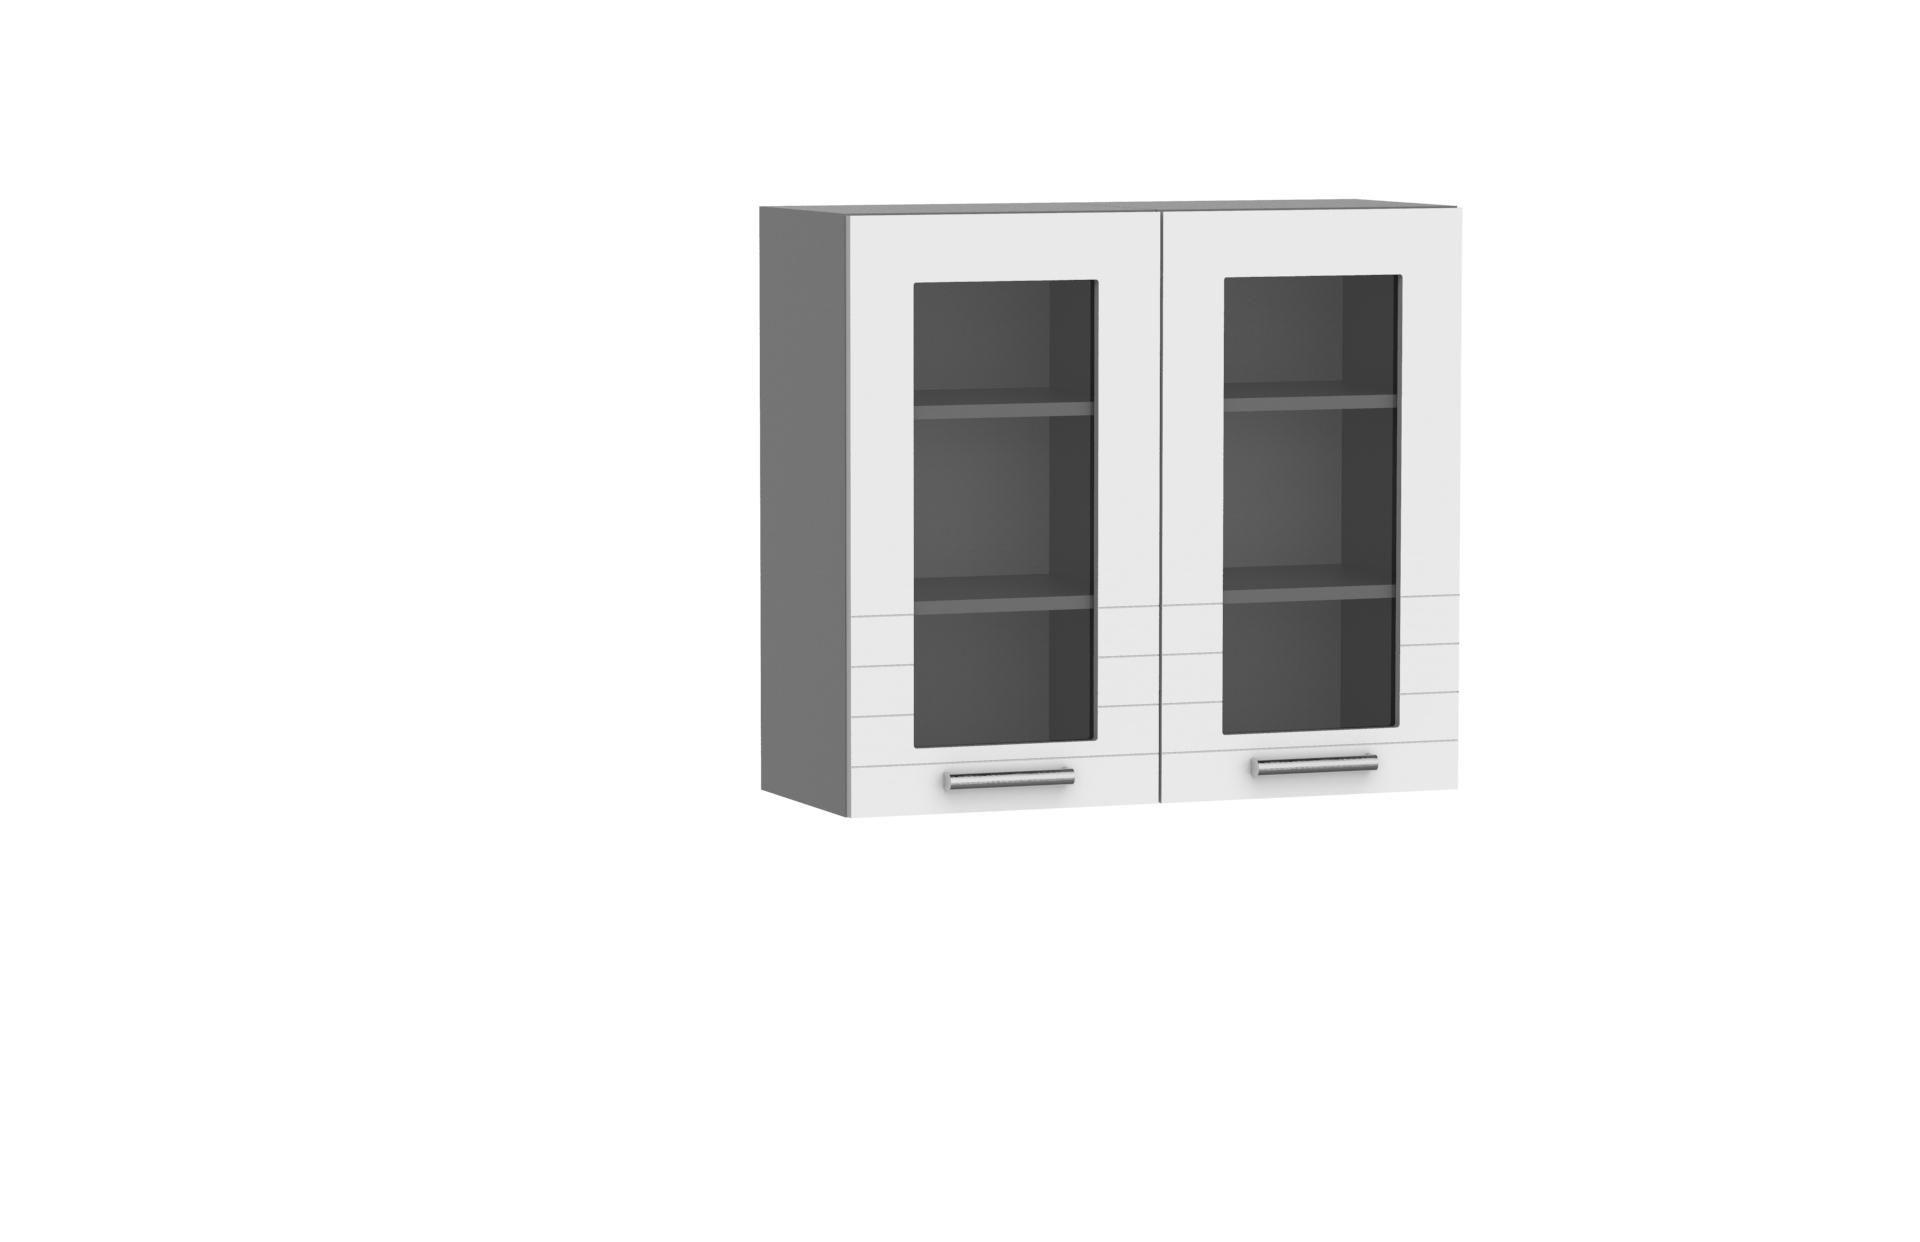 Oberschrank 80 cm / 72 cm mit Glas Paula Weiss